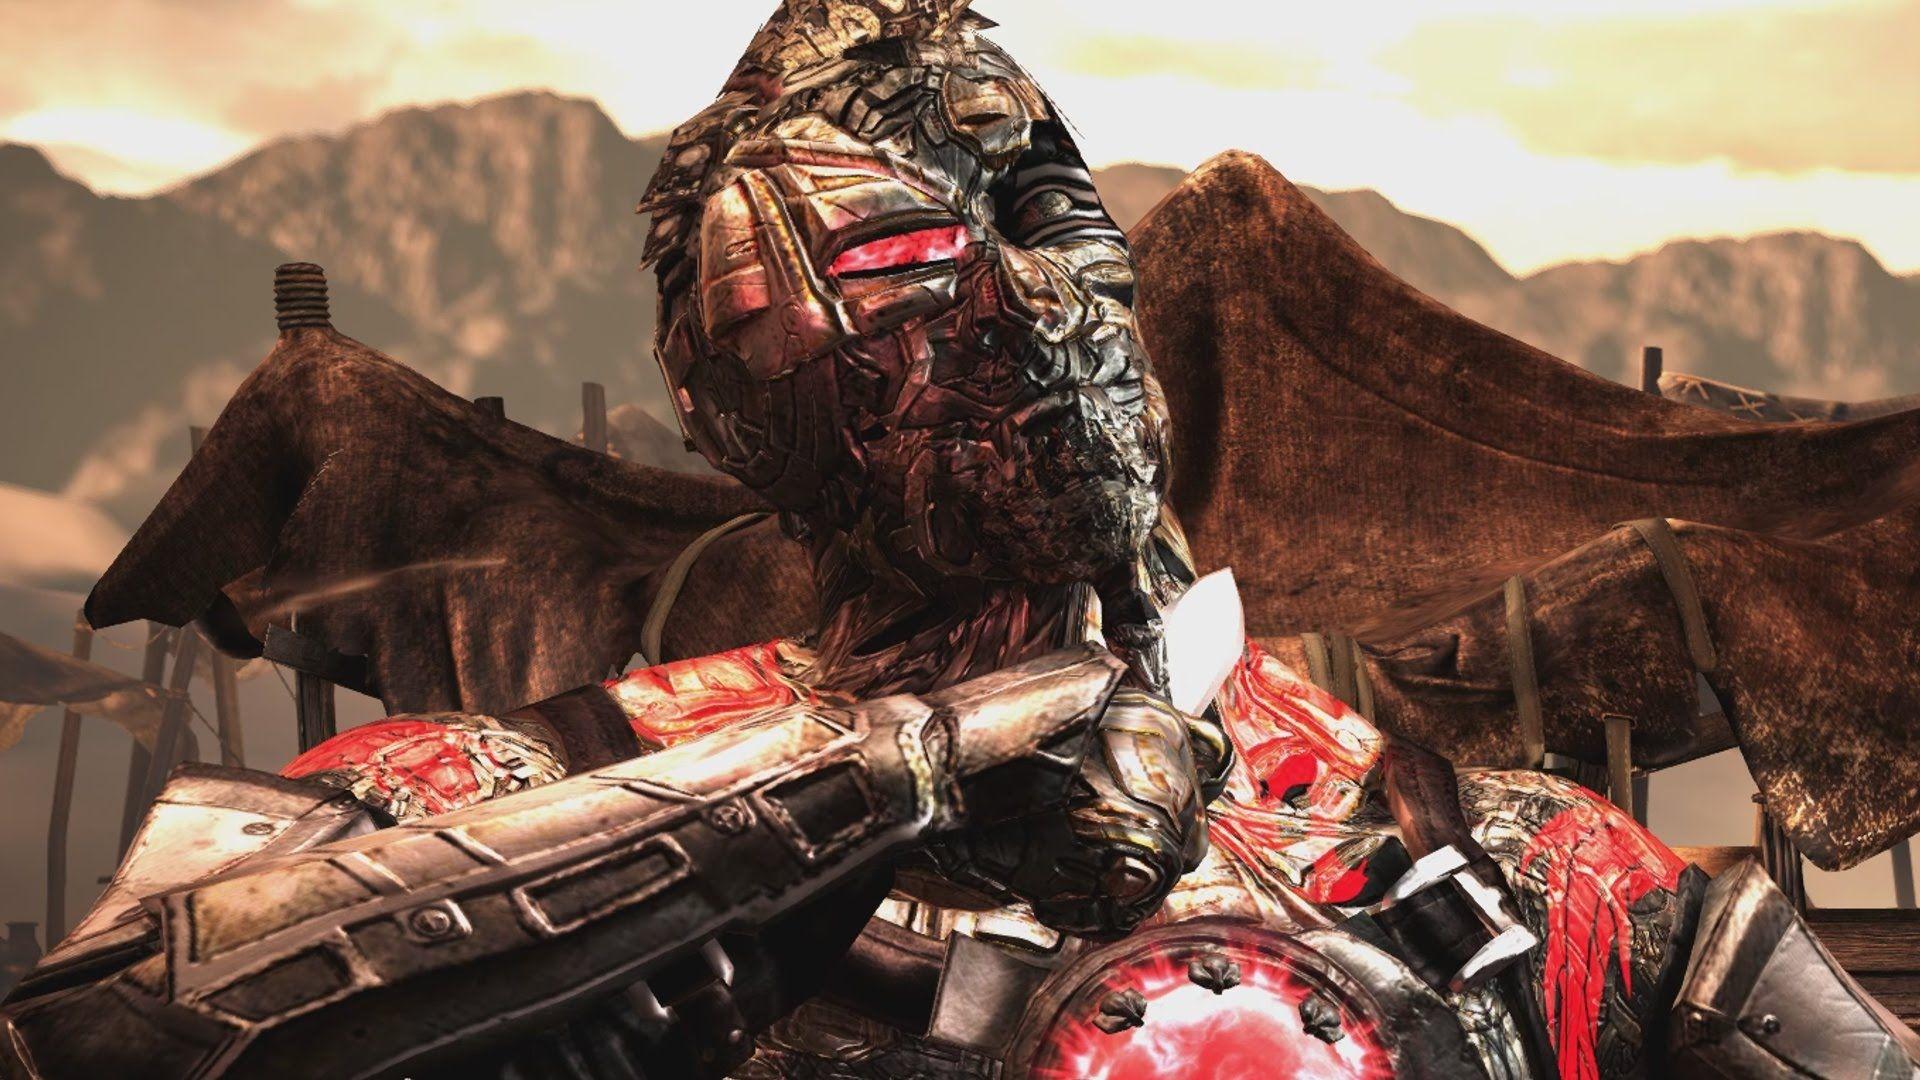 Mortal Kombat X Cybernetic Kano Costume Skin Pc Mod 1080p